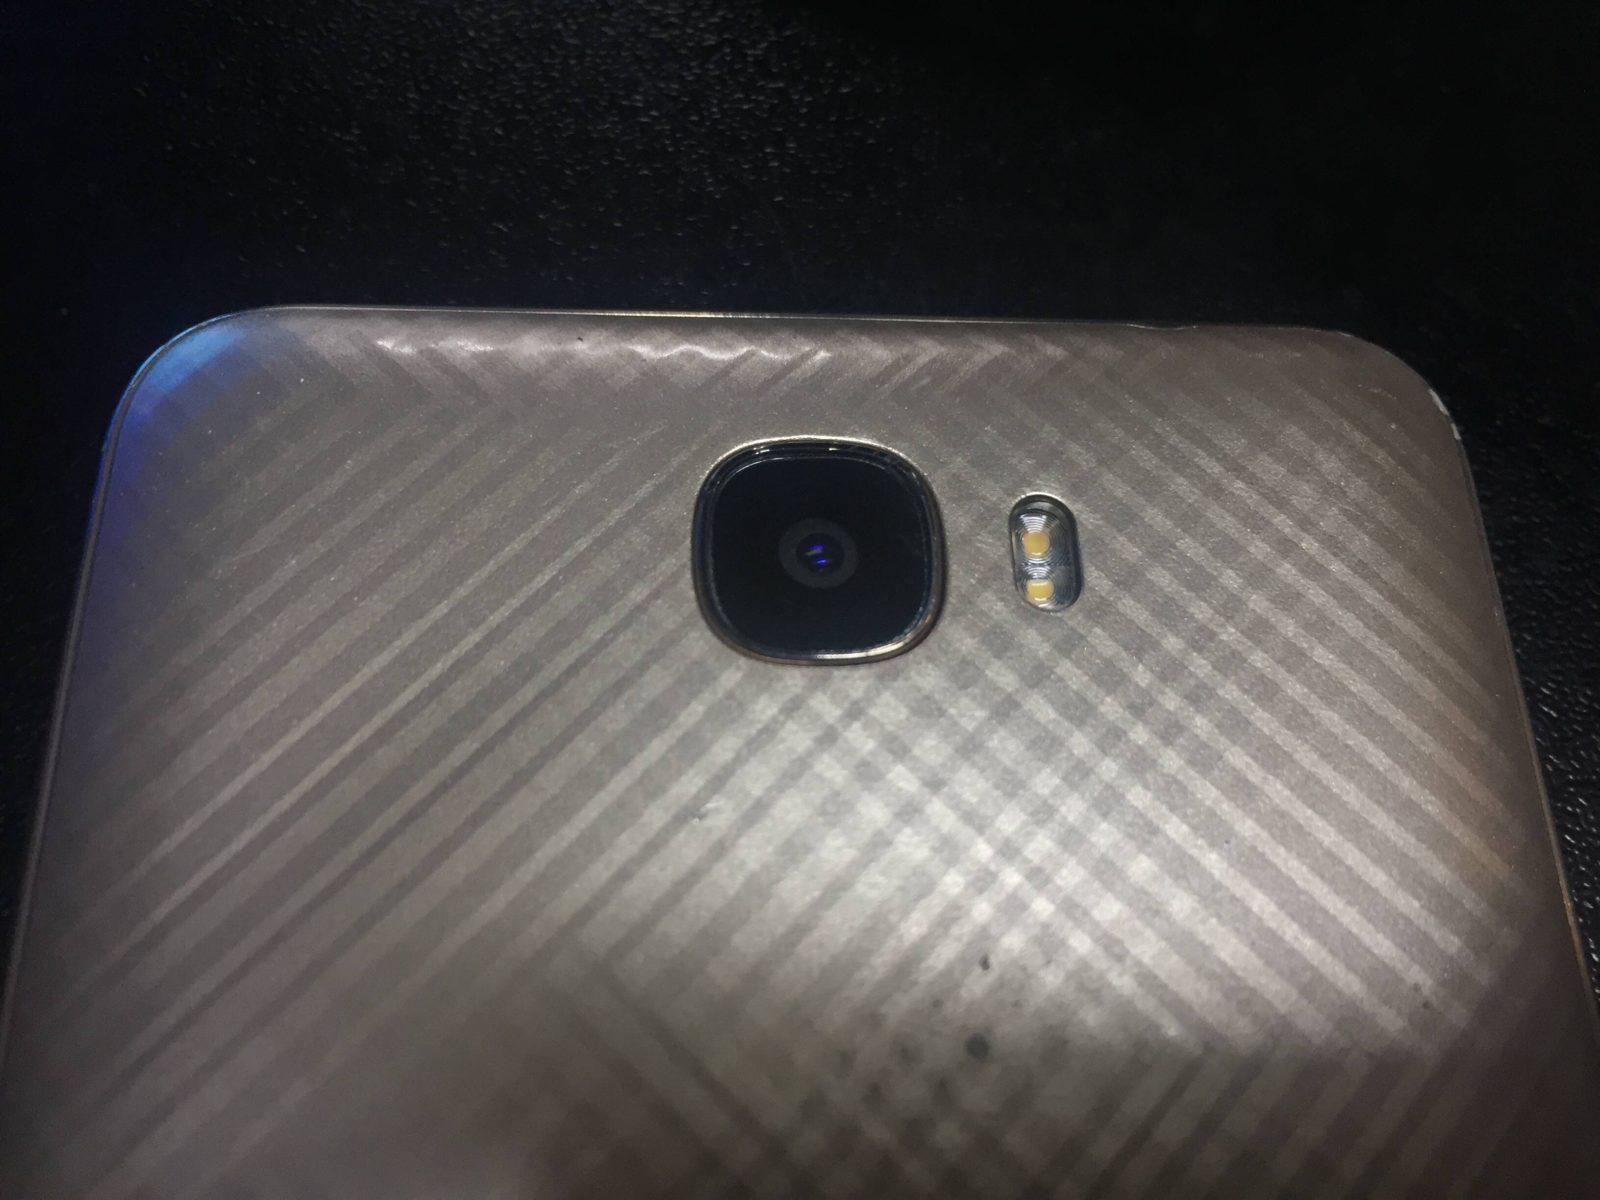 Треснуло стекло камеры Huawei Honor 5a. Подбираем аналог.